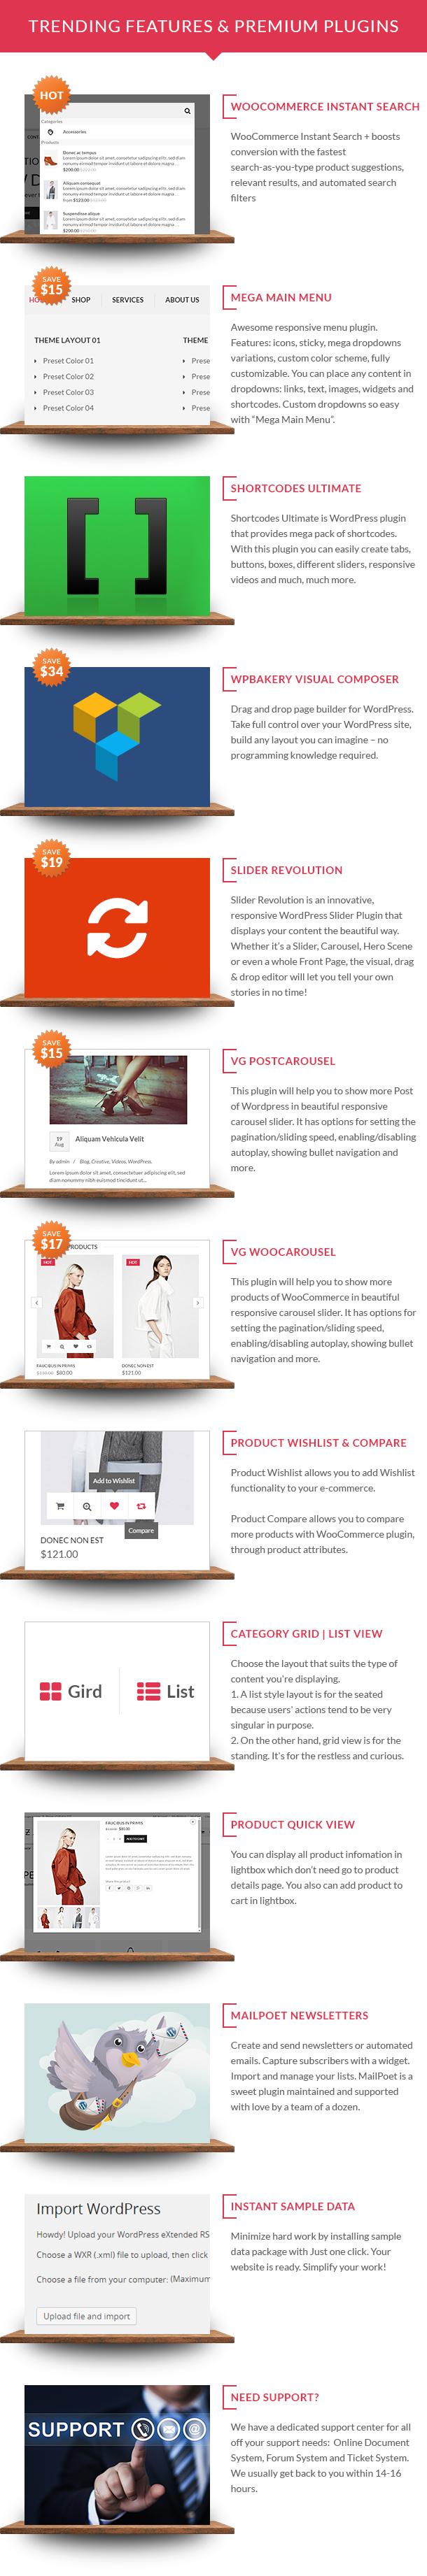 VG Mozar - Fashion WooCommerce WordPress Theme - 40